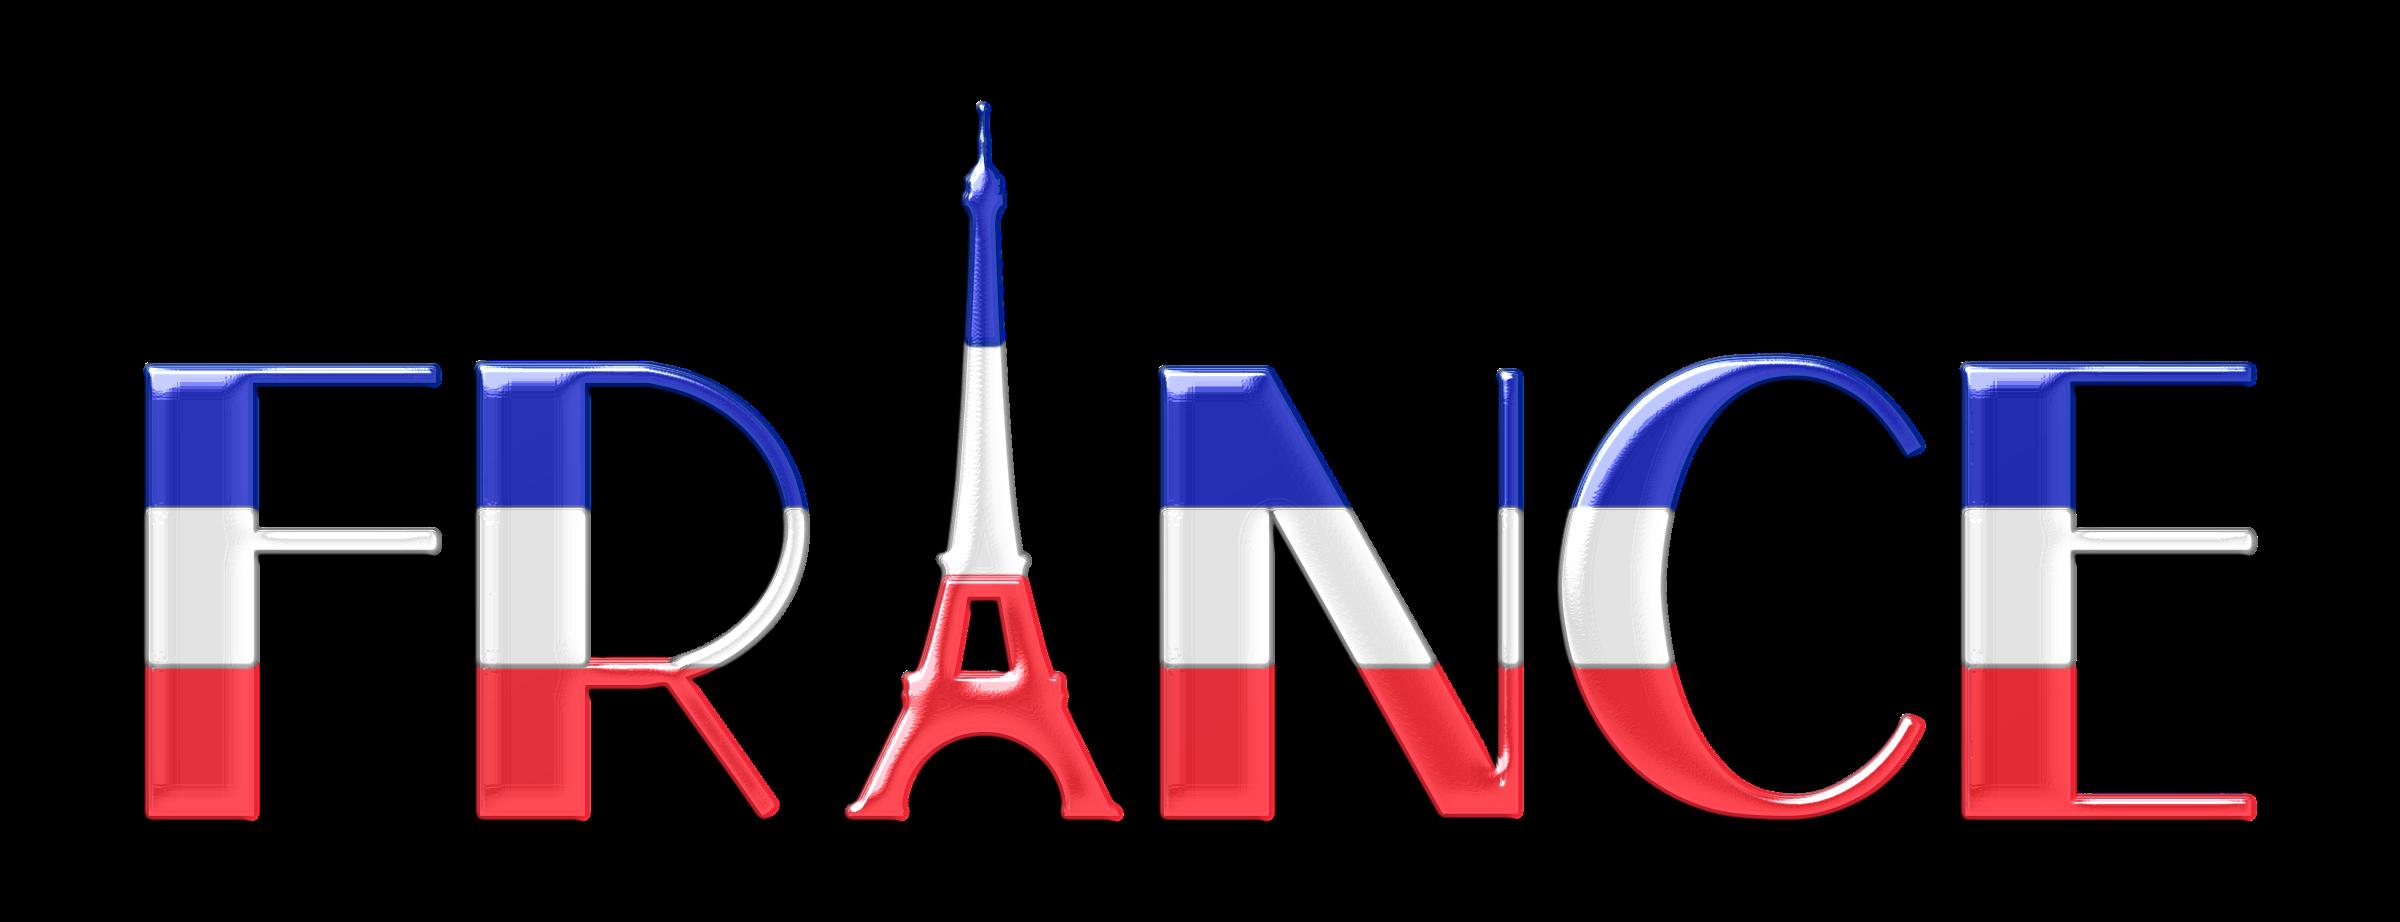 freeuse download France clipart. Typography enhanced big image.